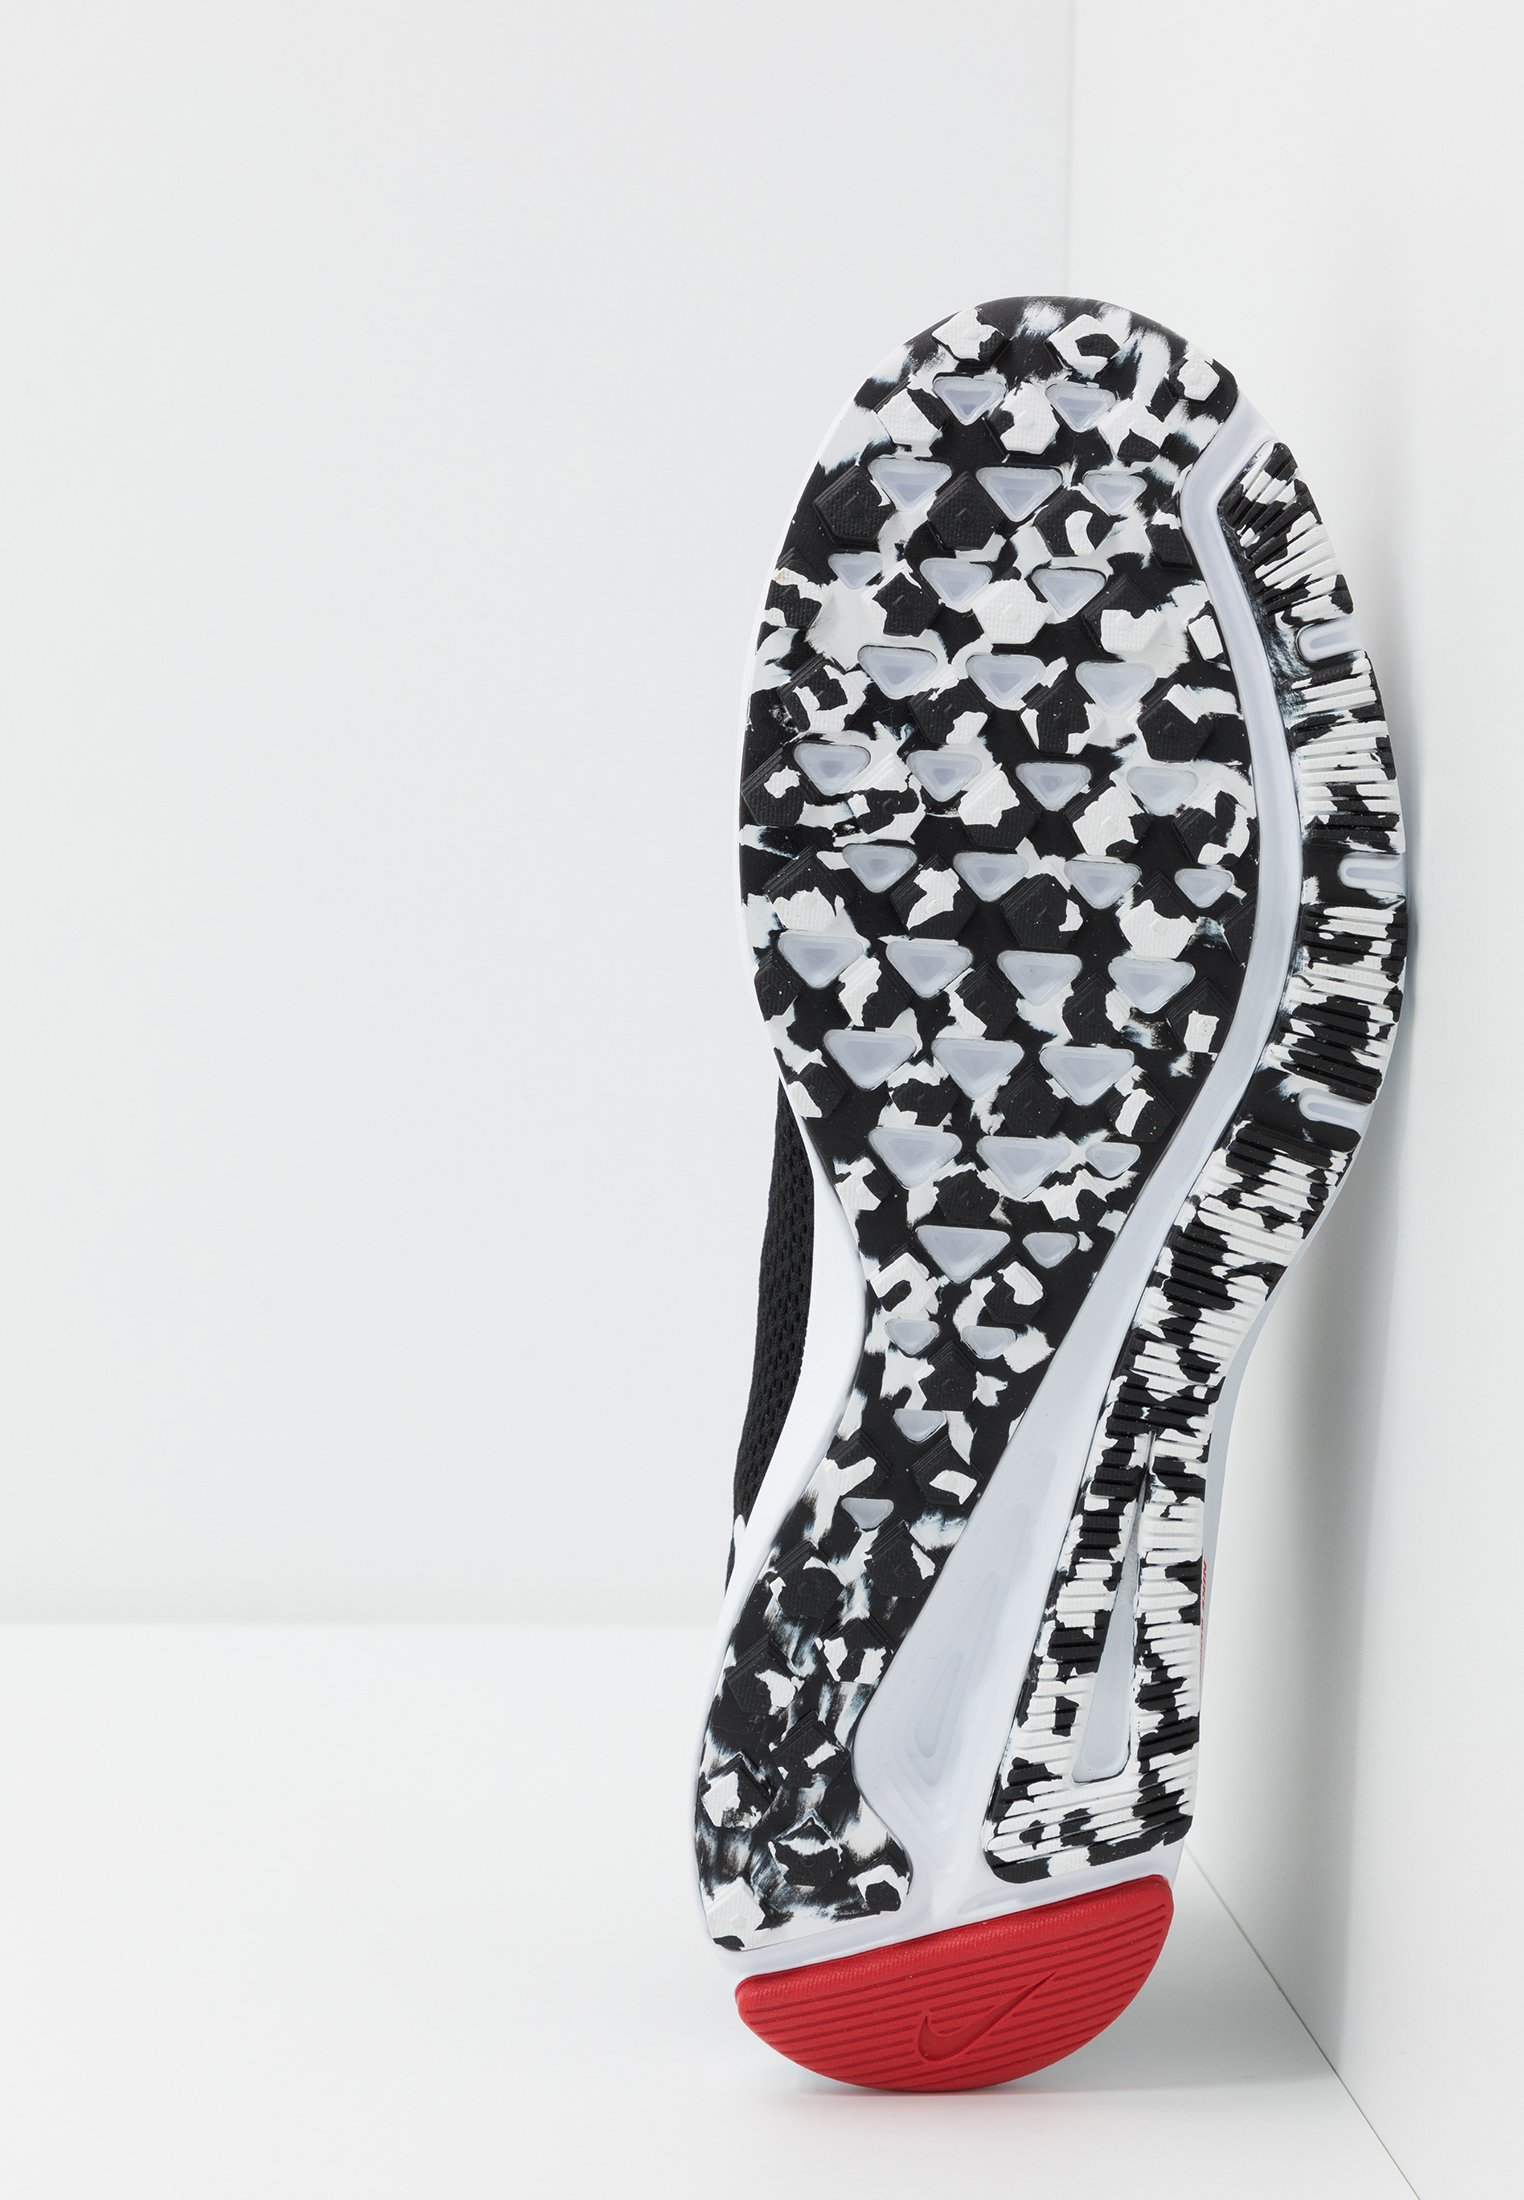 Super Tilbud Køb Nyeste Herresko Nike Performance QUEST 2 Neutrale løbesko black/white/anthracite/university red jyJ7Va tzAqJm